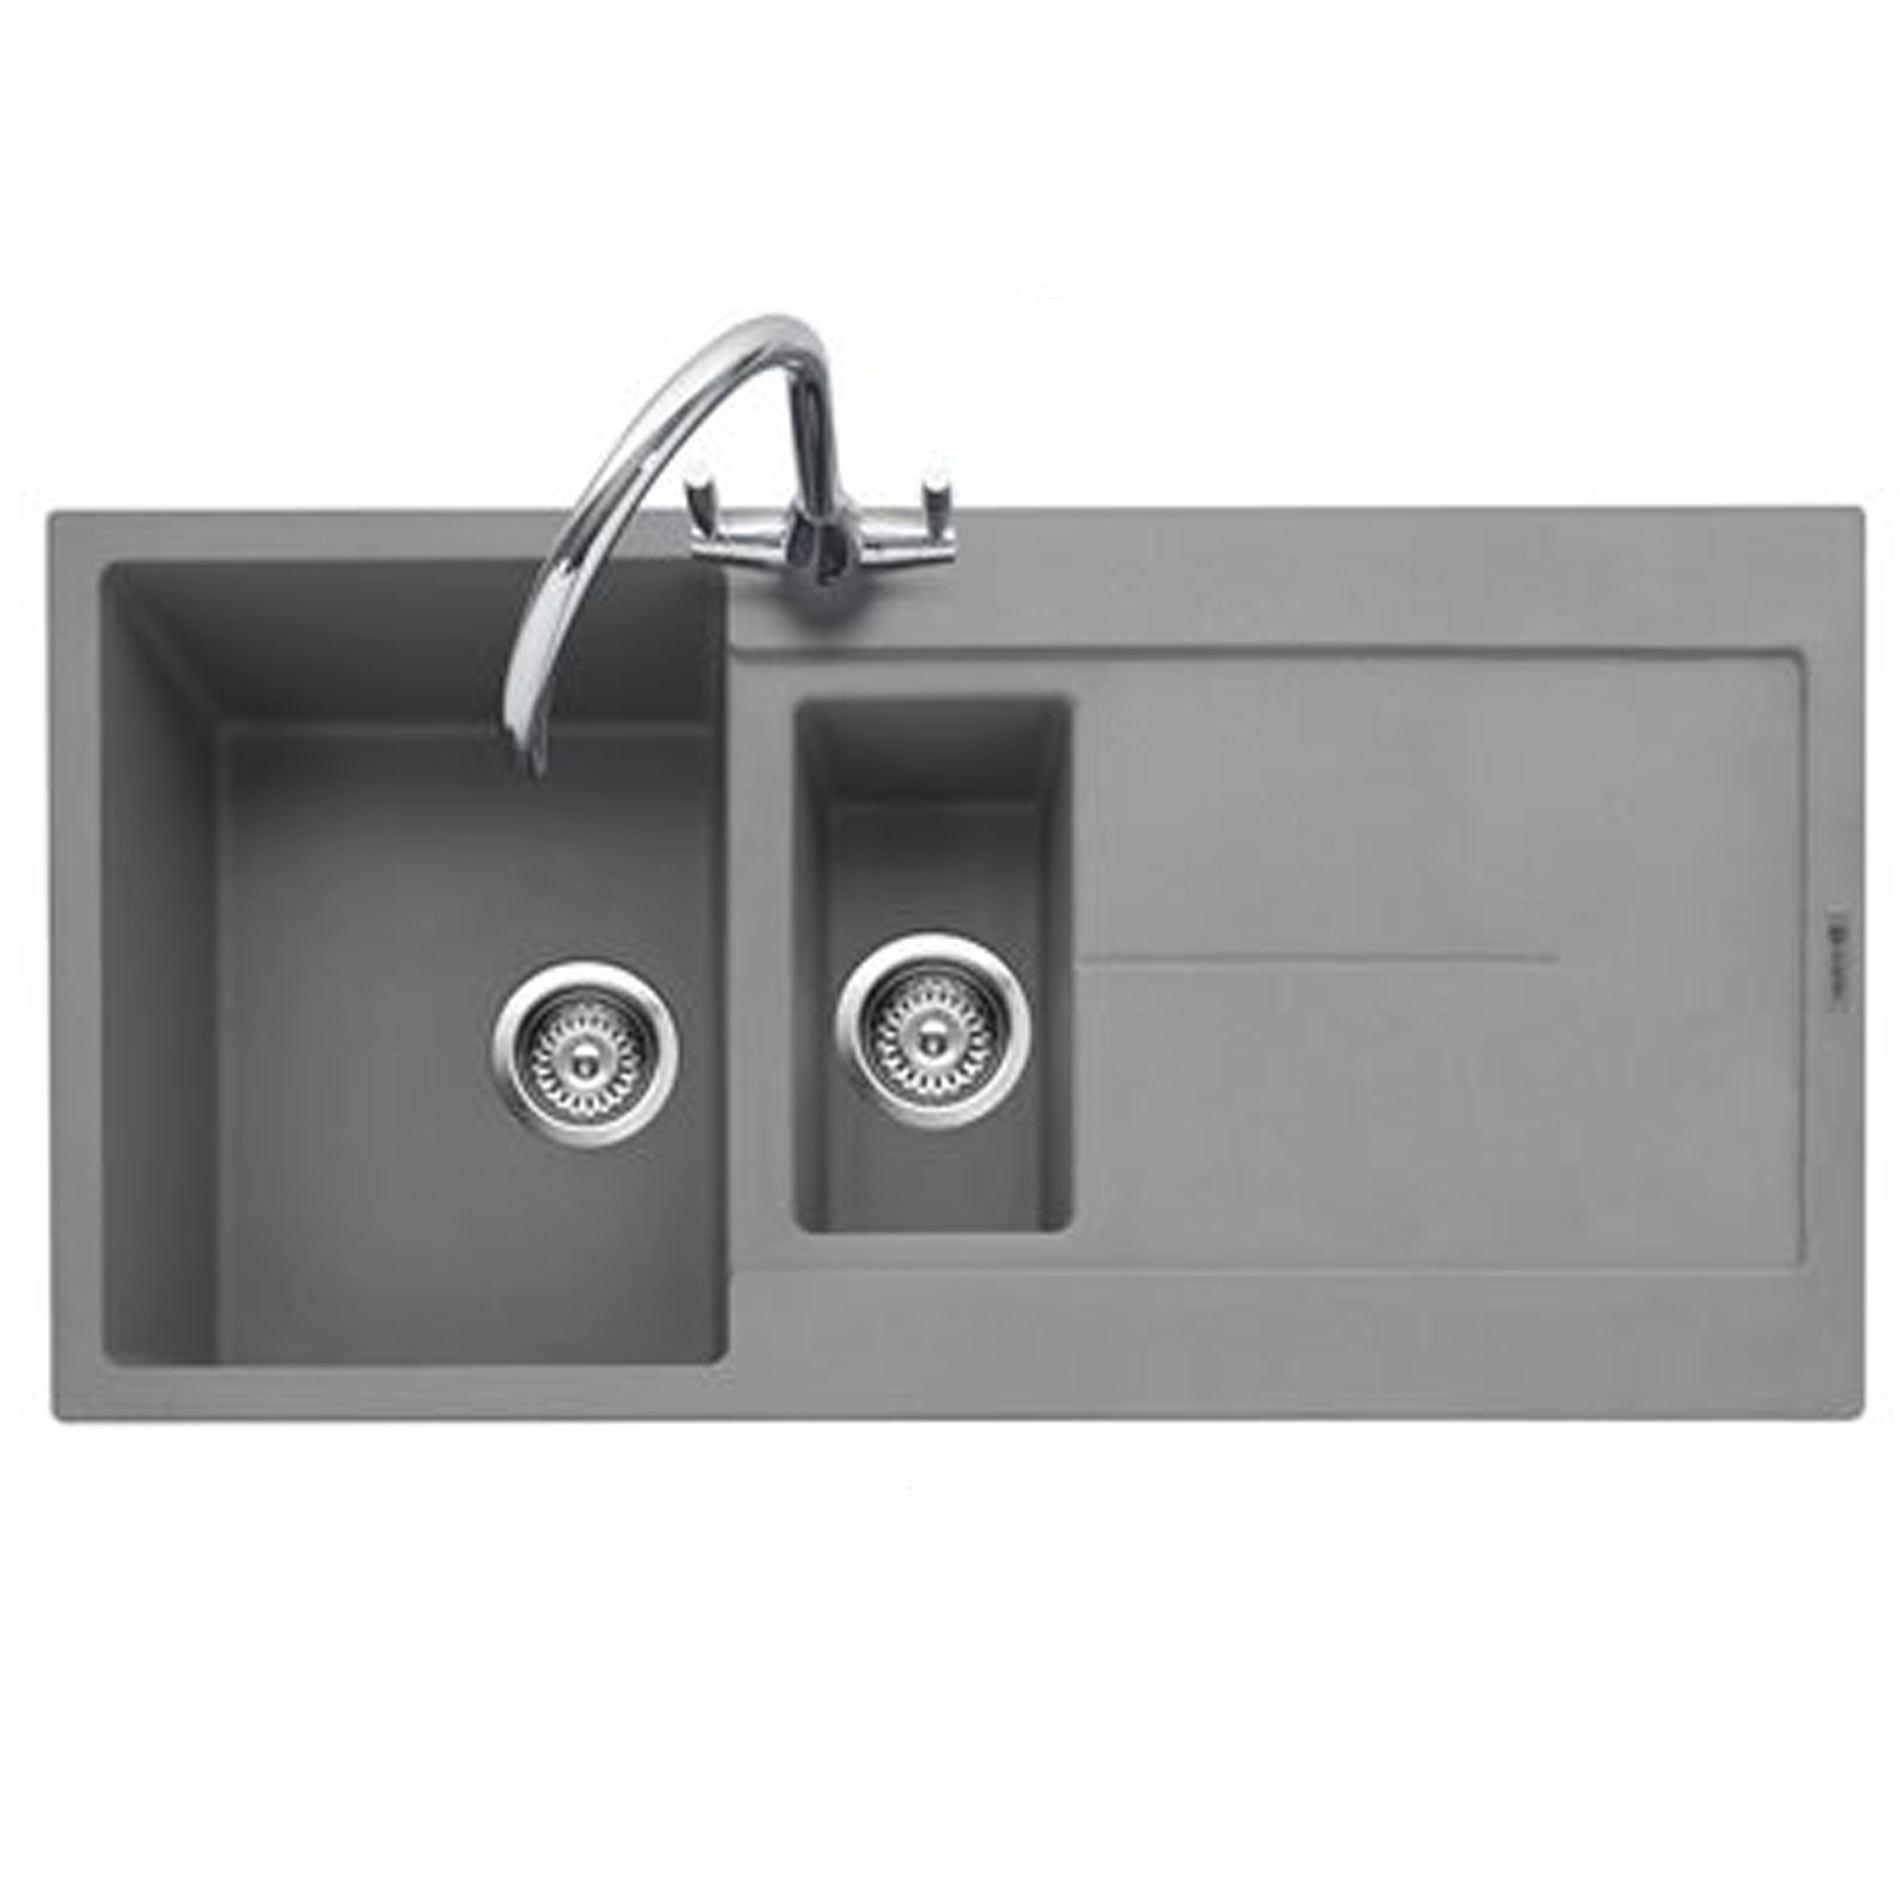 Grey Granite Sink : Caple: Canis 150 Pebble Grey Granite Sink - Kitchen Sinks & Taps